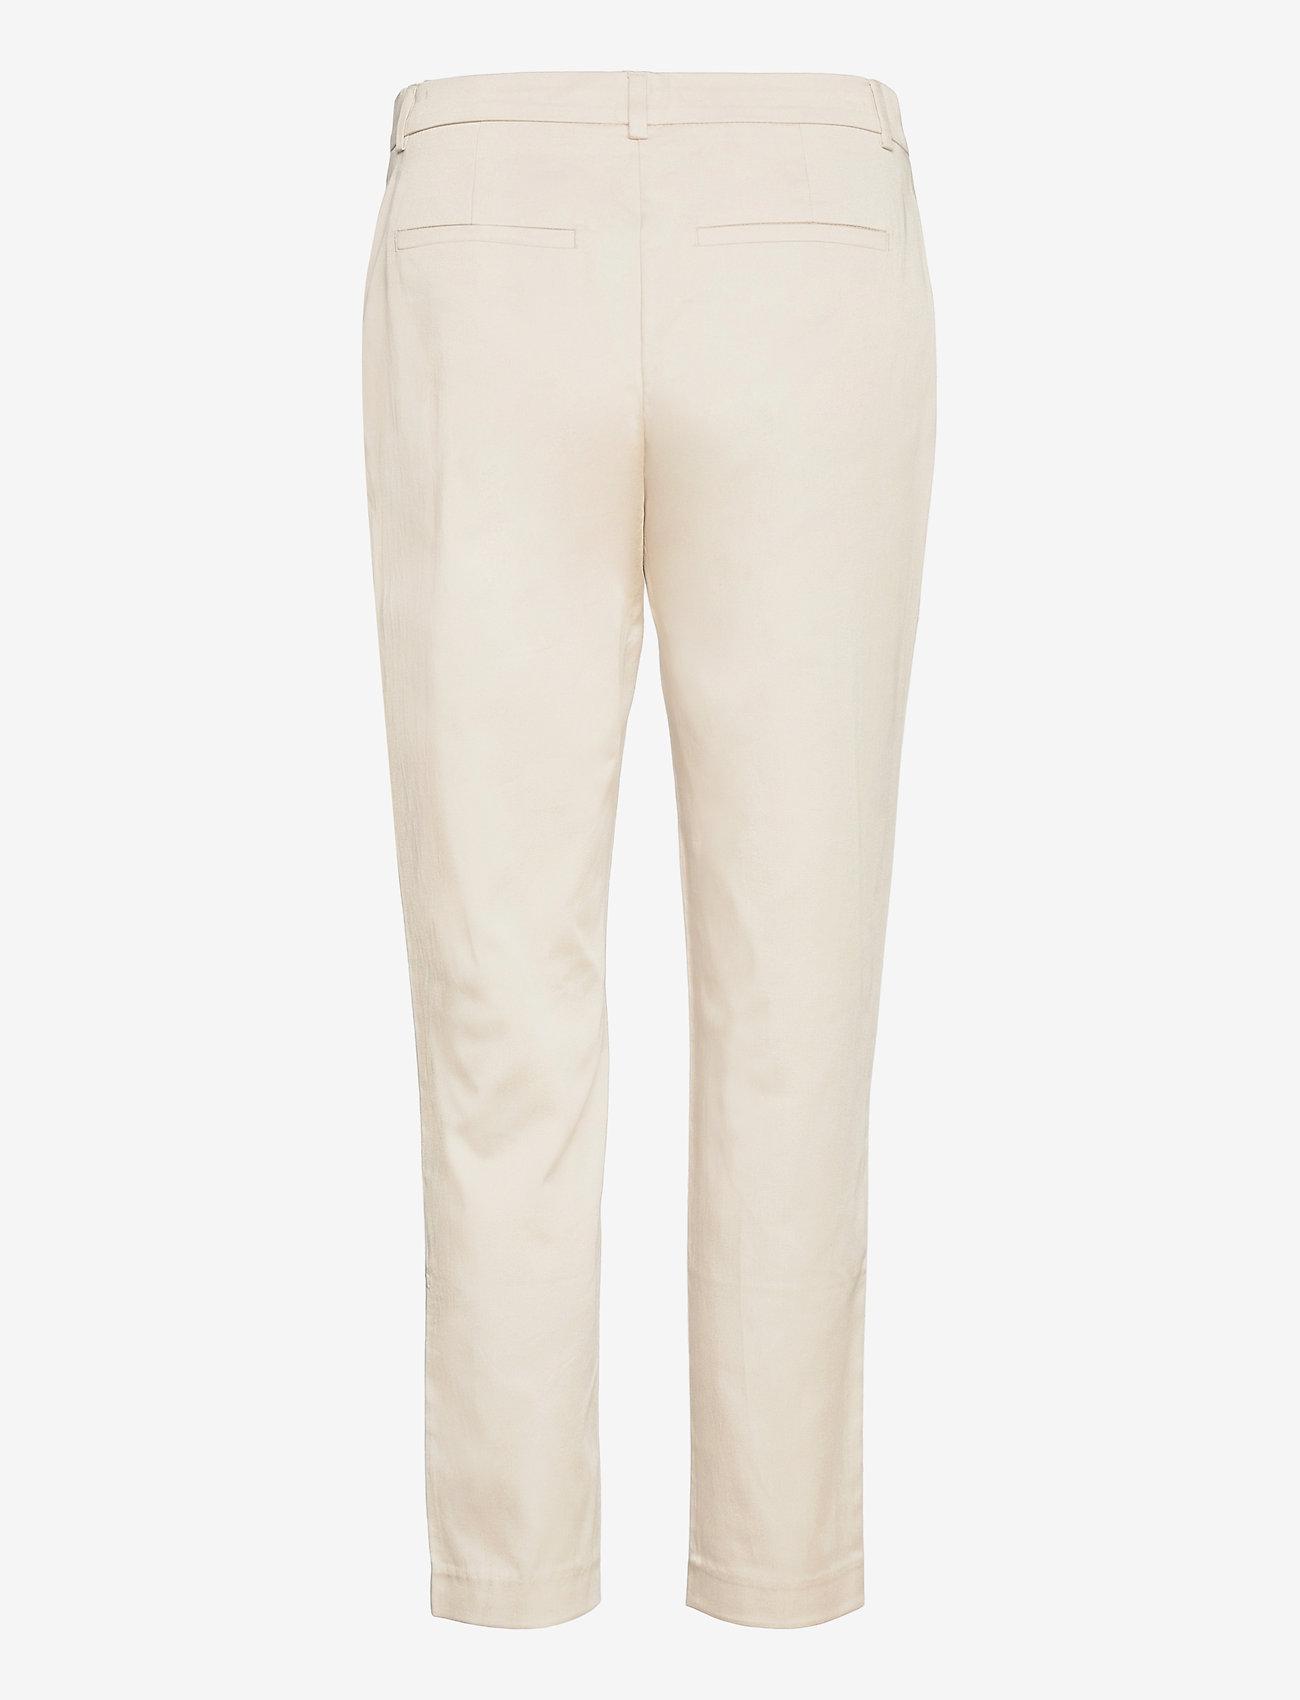 FIVEUNITS - Kylie Crop 531 - bukser med lige ben - moonbeam - 2